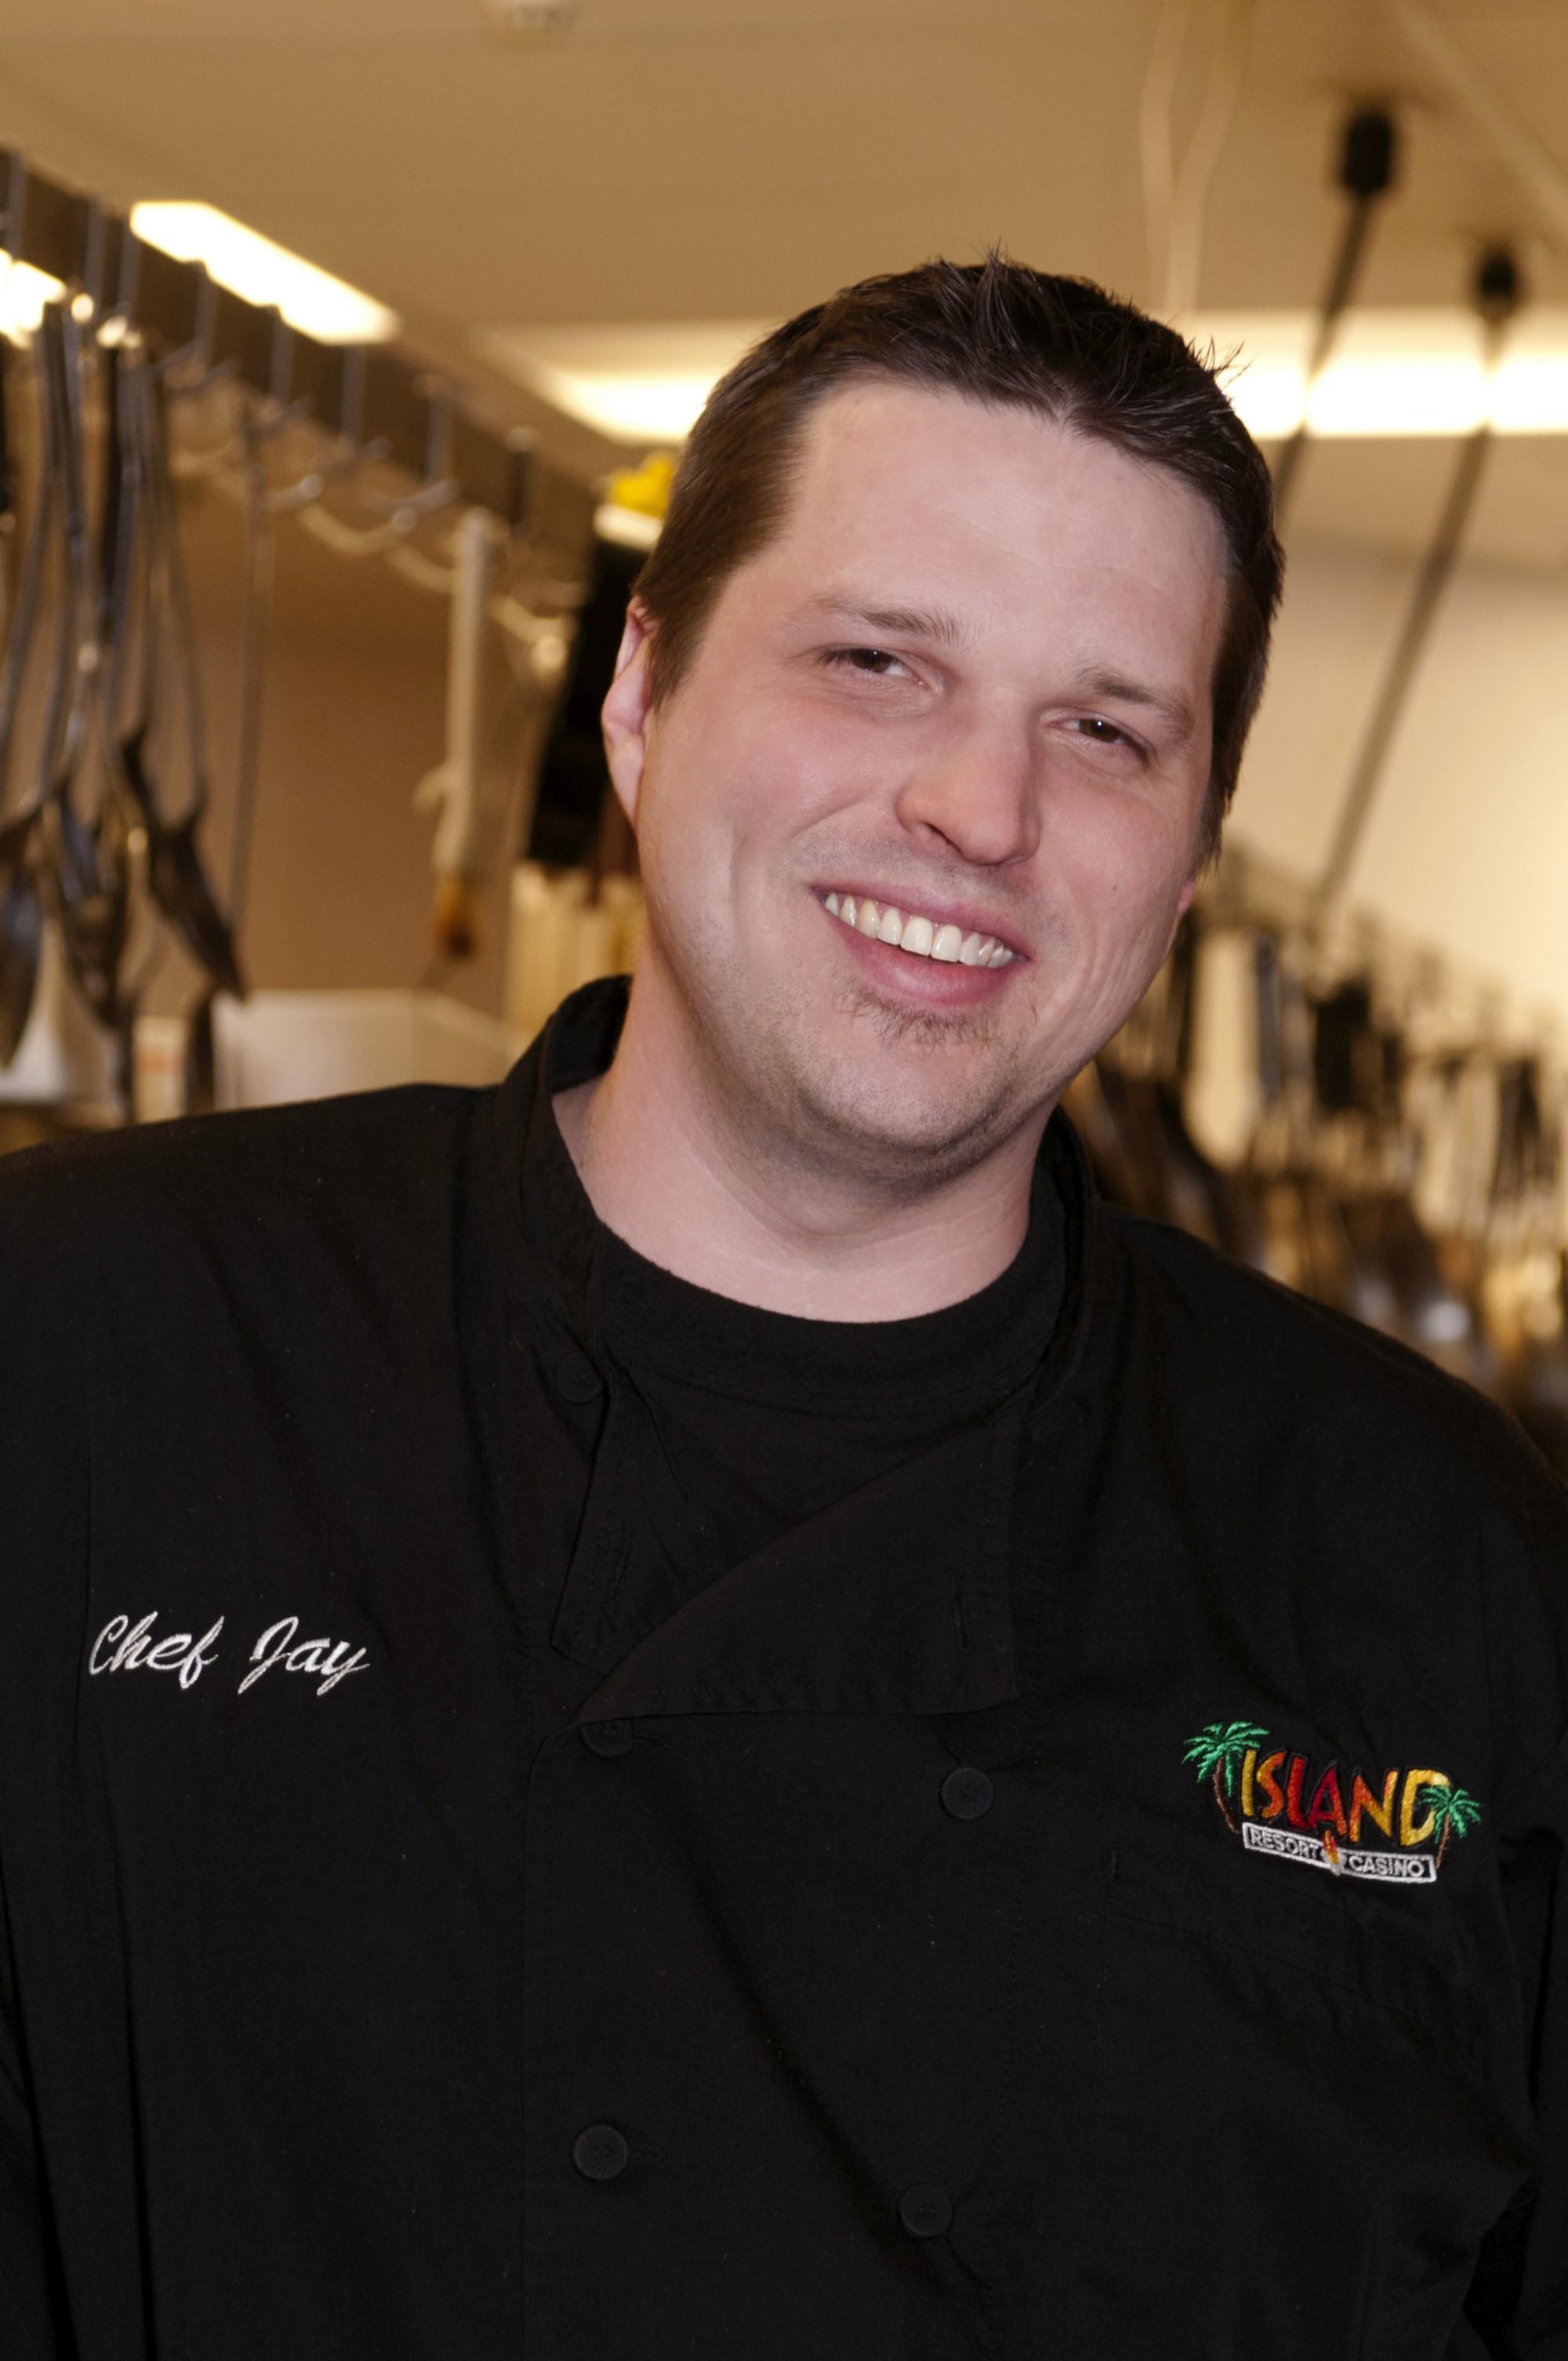 Executive Chef, Jay Fehl